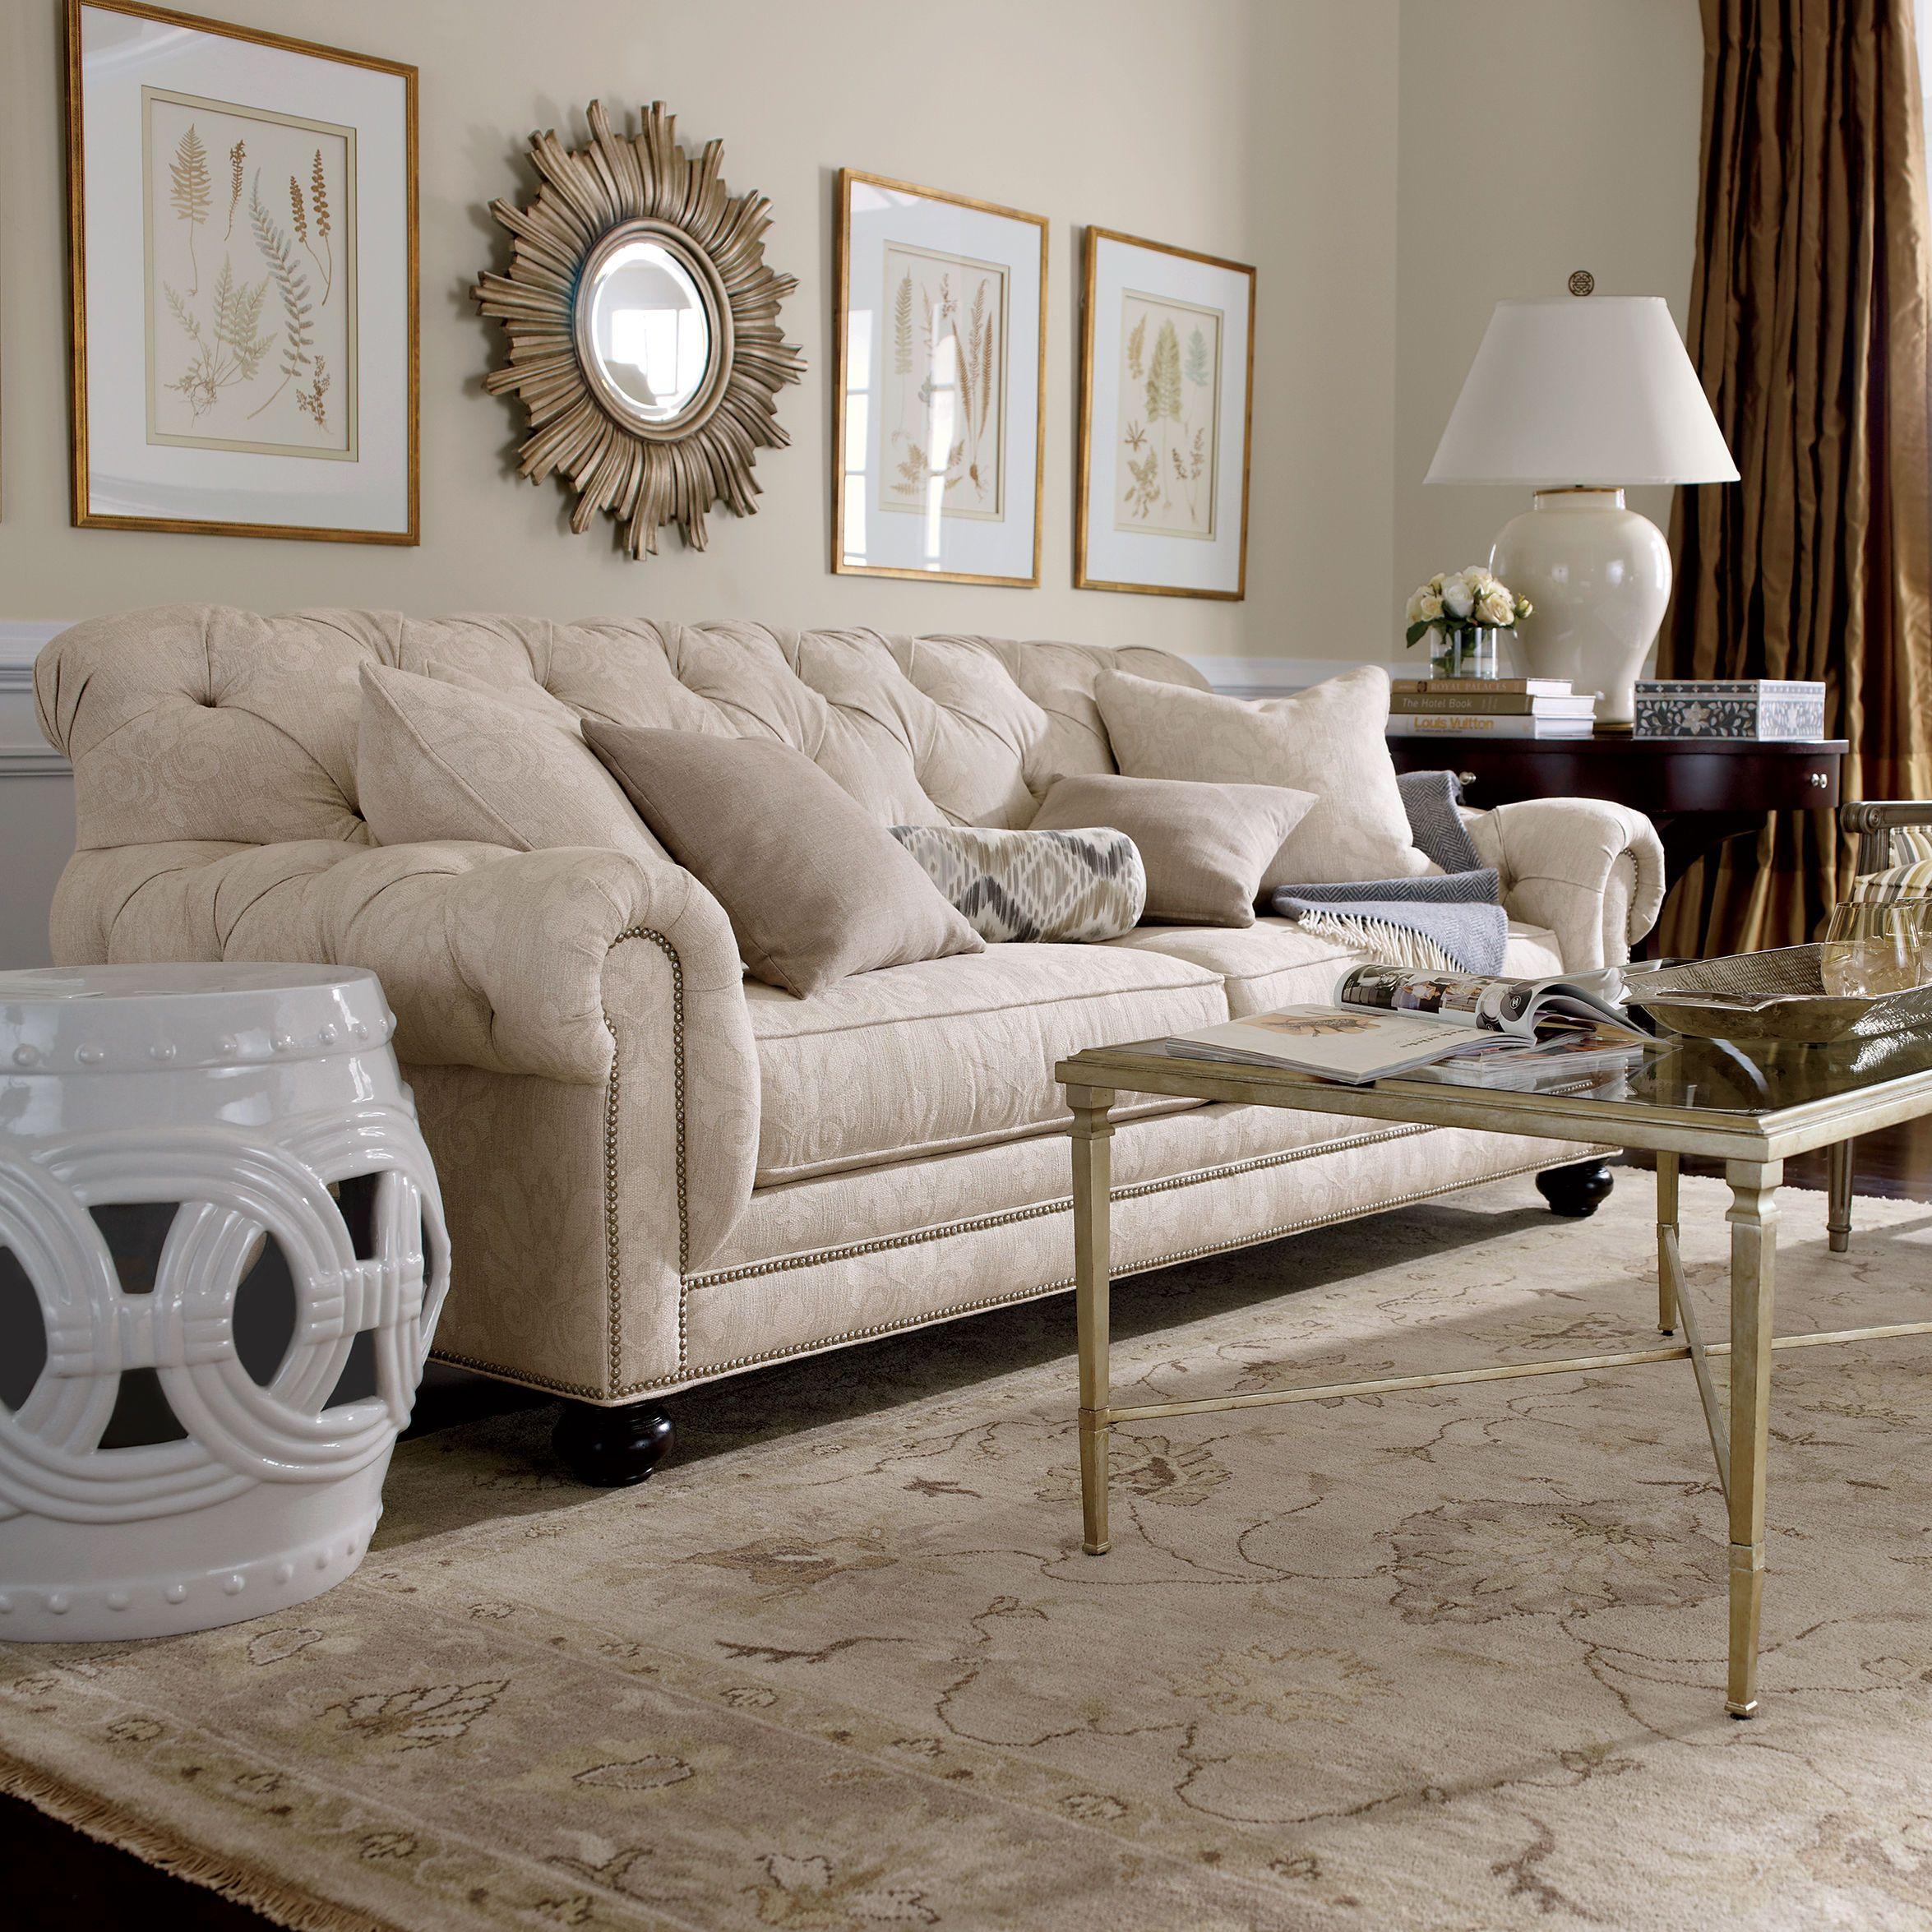 Fern Impressions B Ethan Allen Us Living Family Room